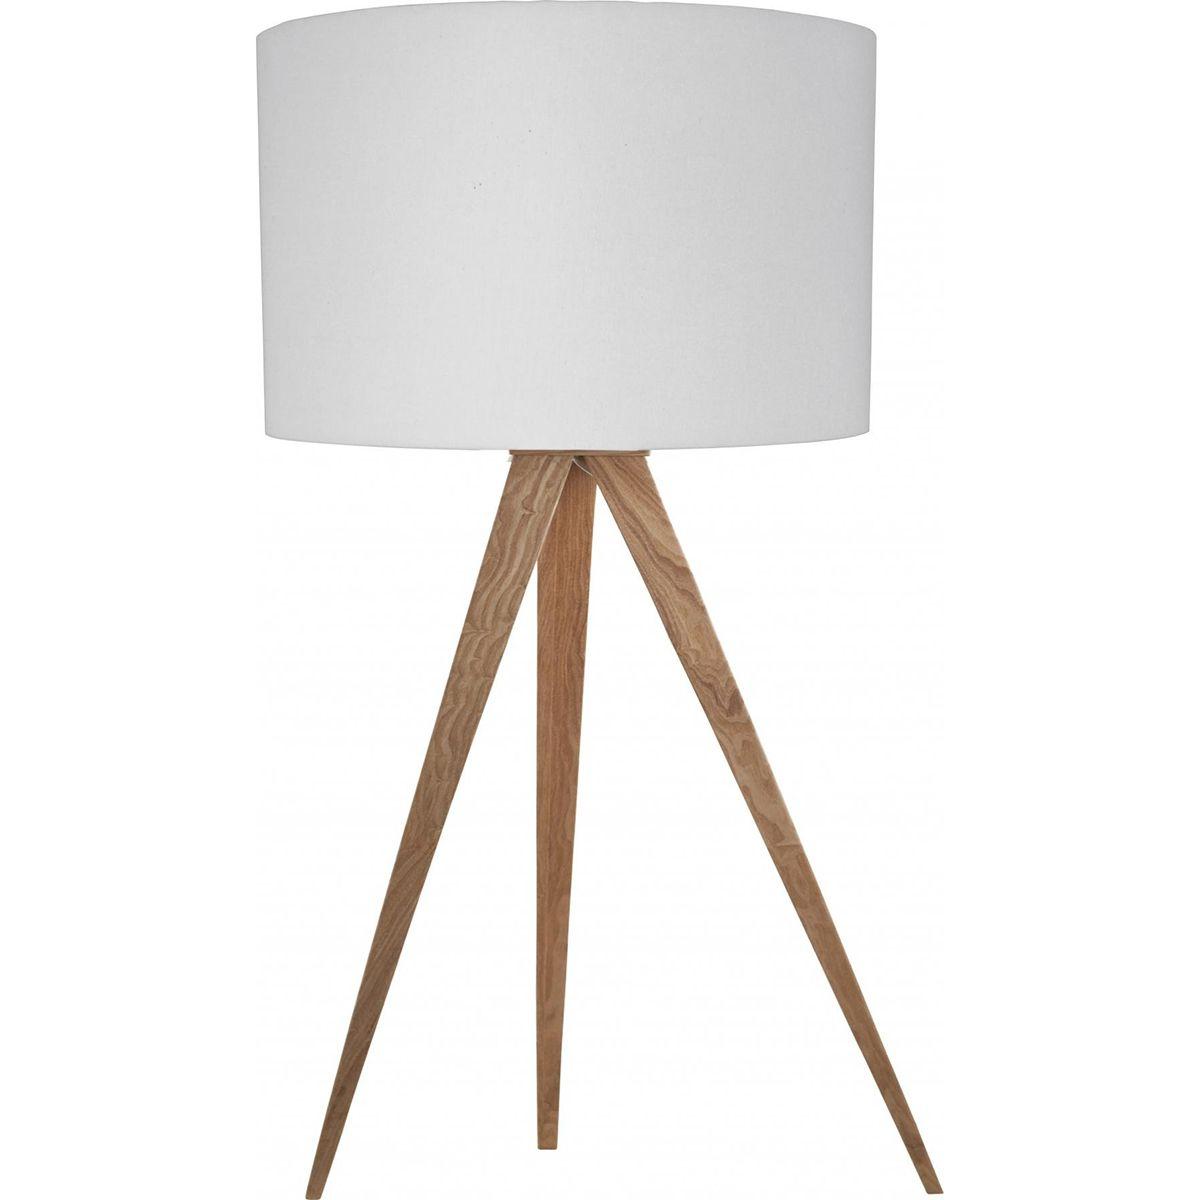 Tripod Wood Table Lamp Table Lamp Wood Lamp White Table Lamp